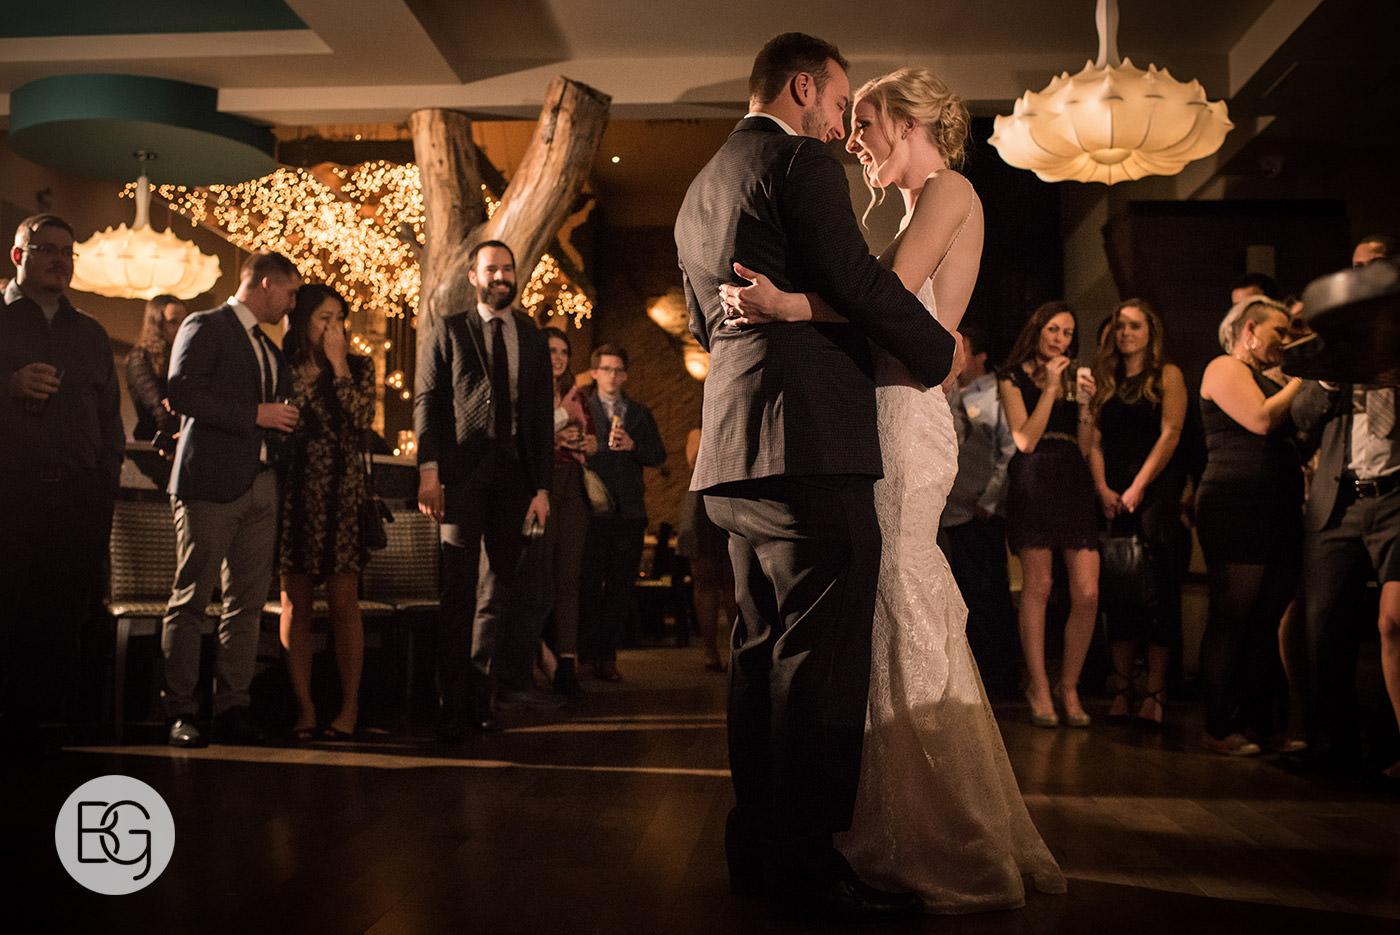 Edmonton_wedding_photographers_josh_sara_whyte_44.jpg